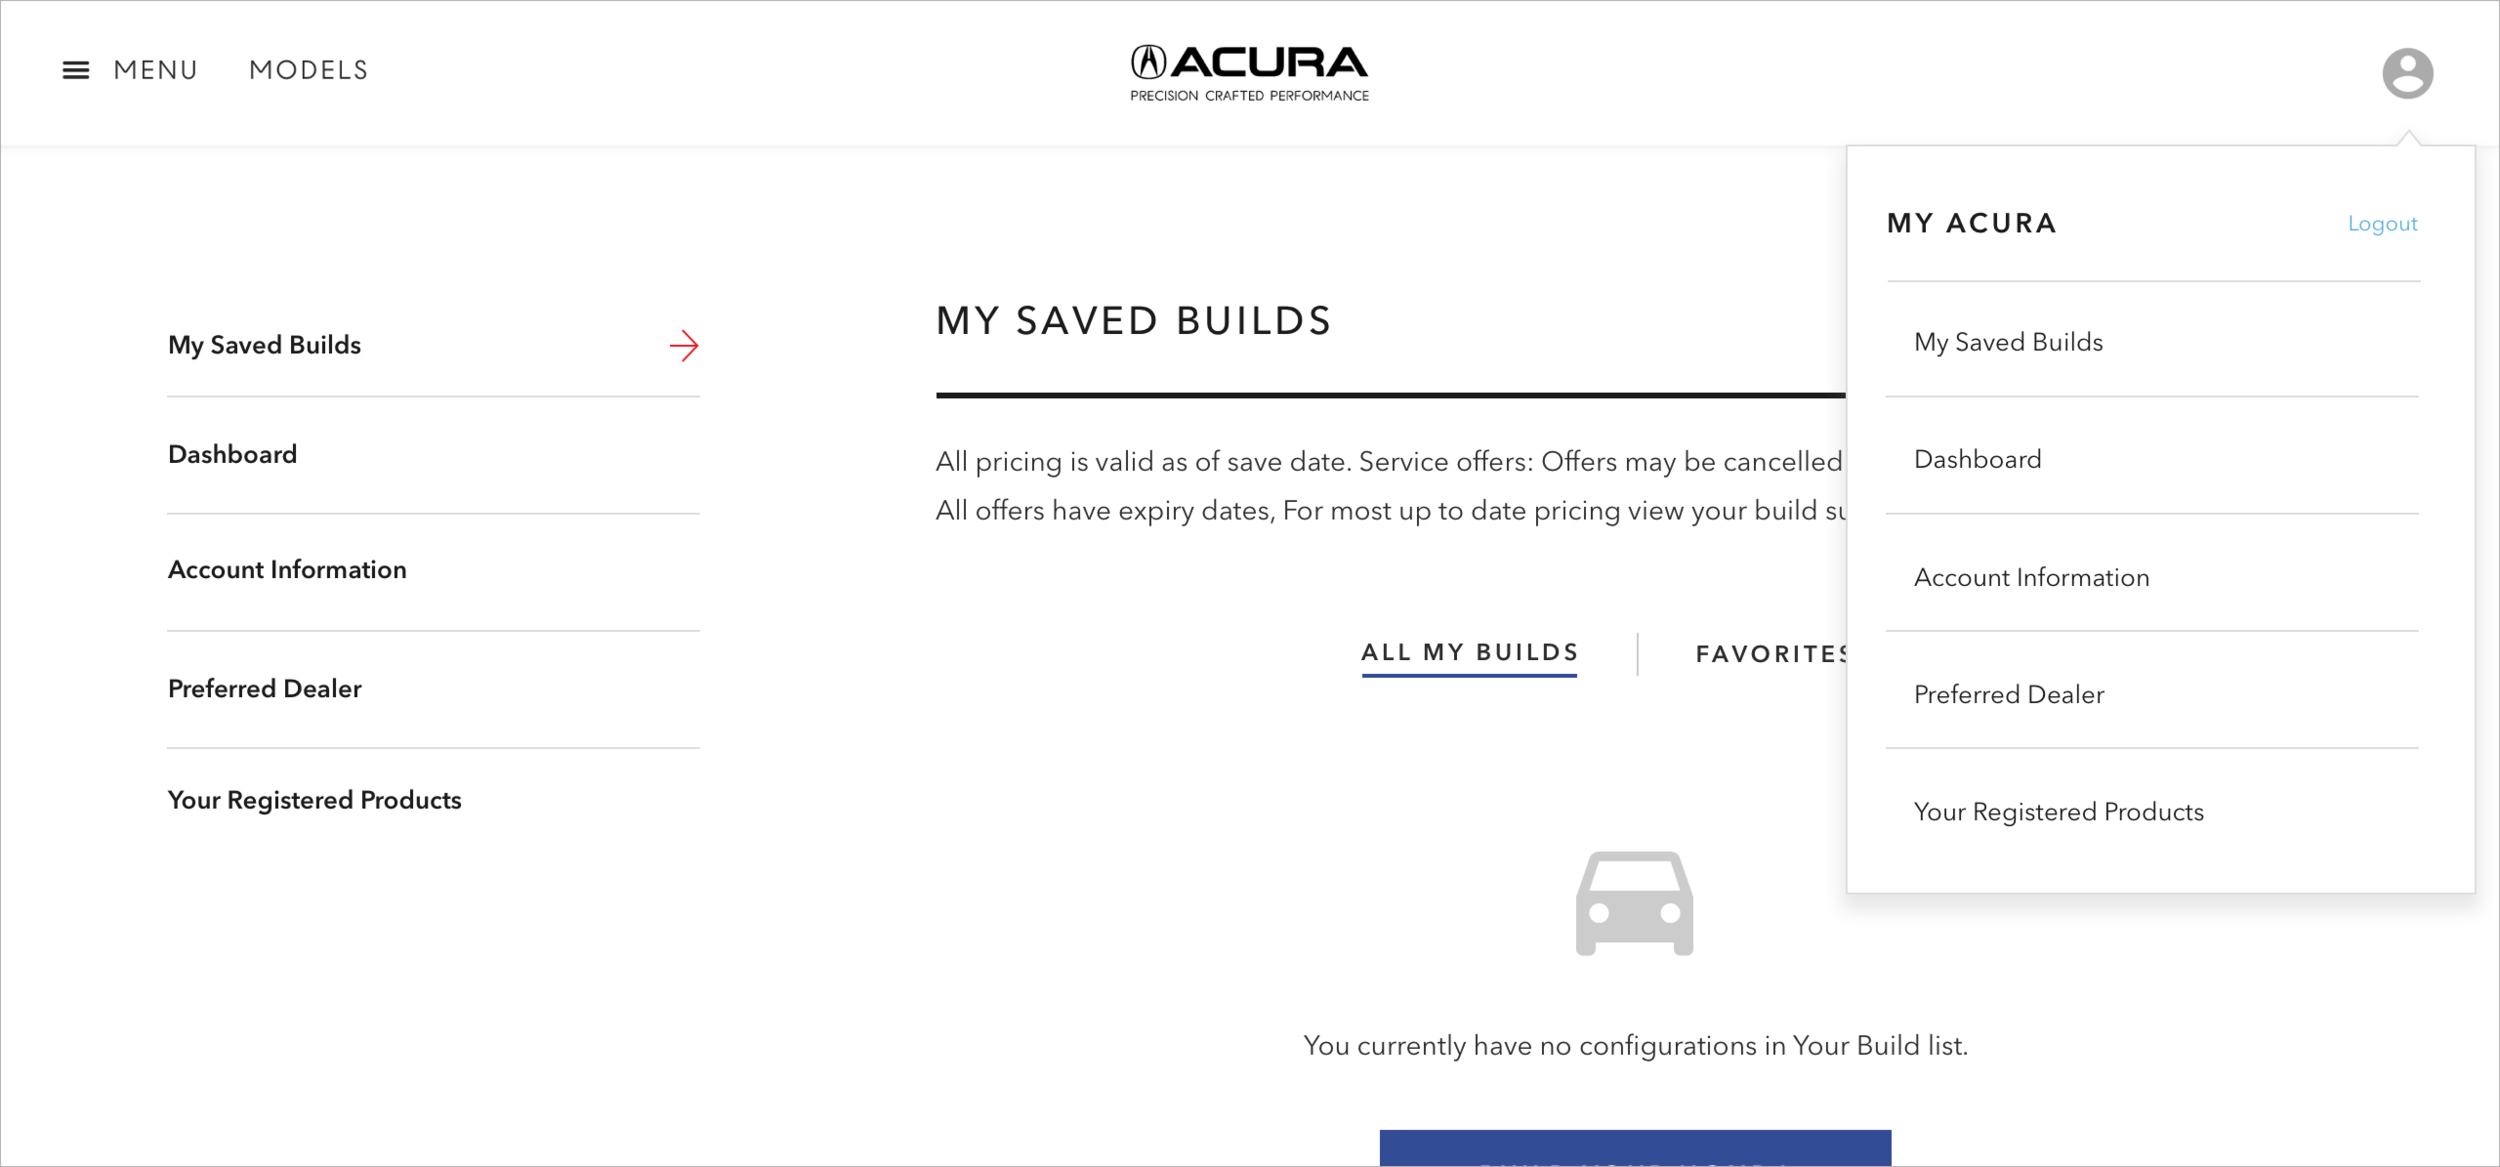 2560 - navigation - Acura.png